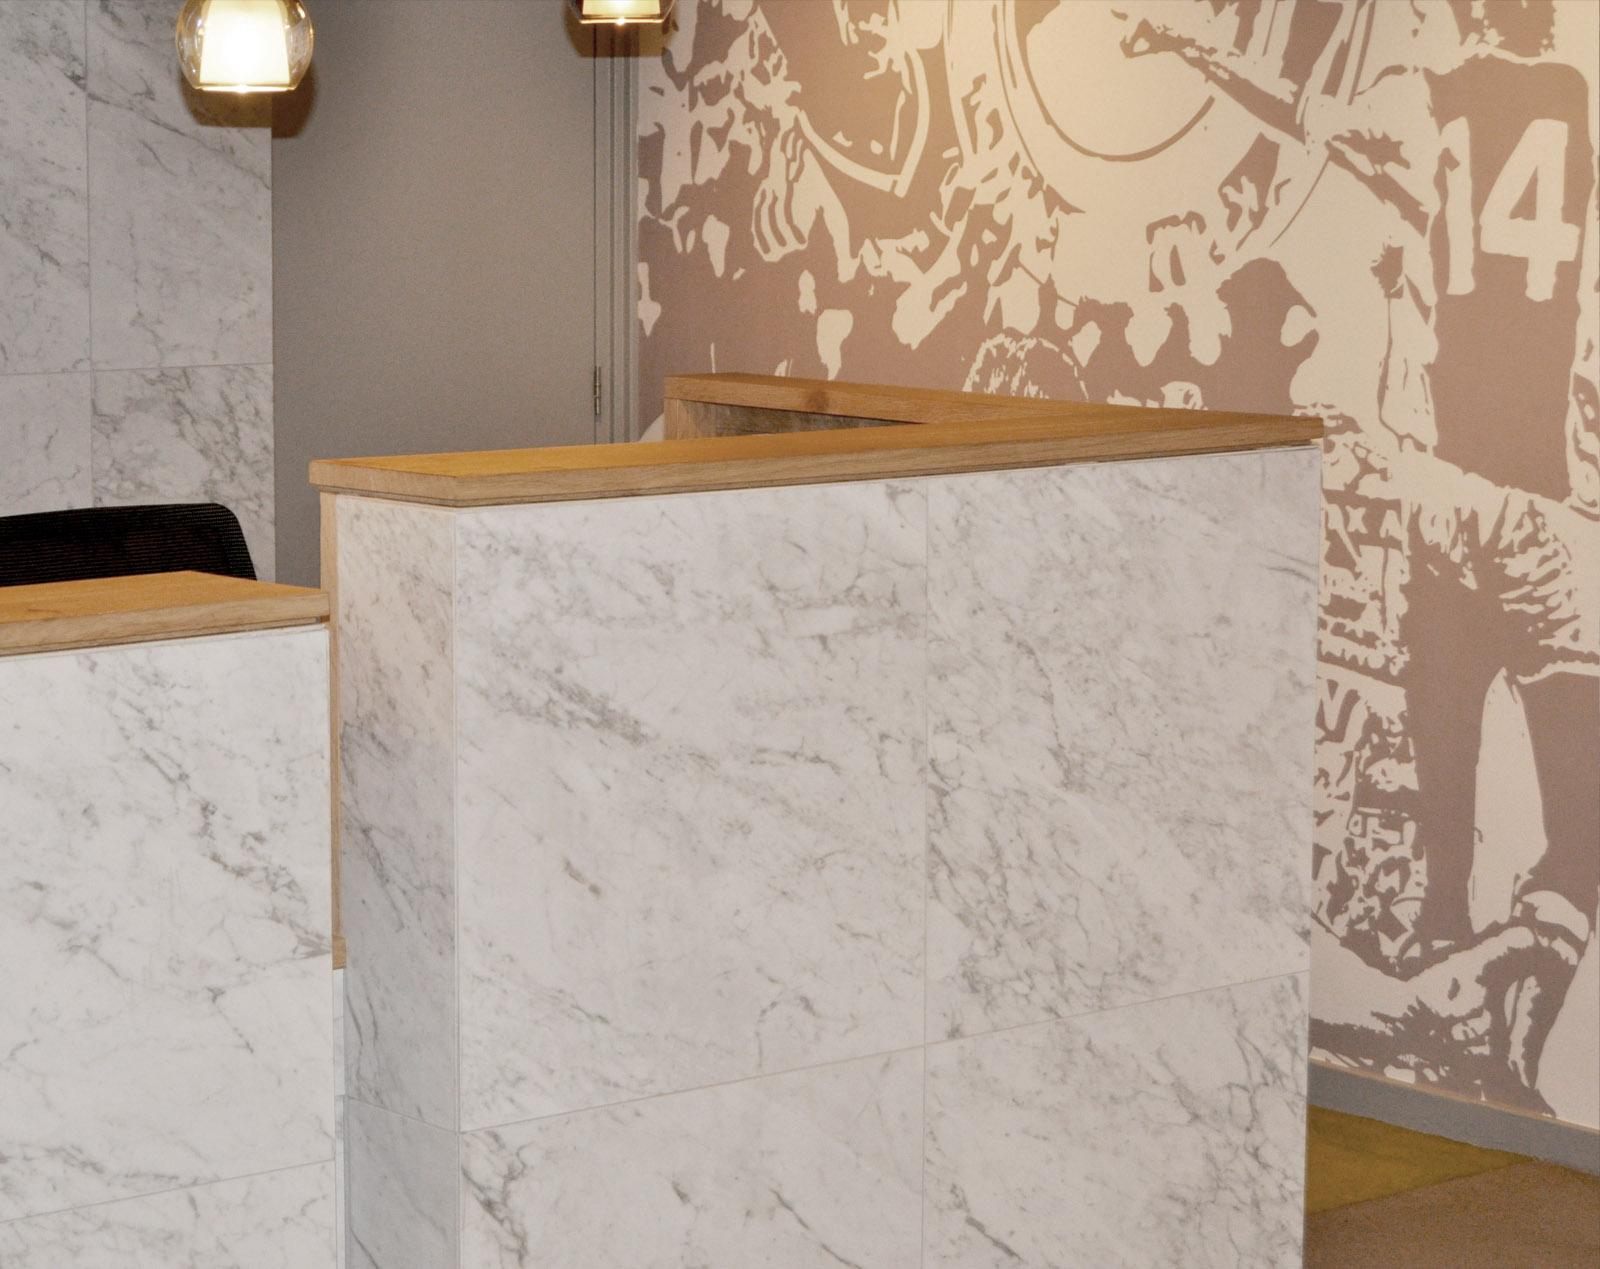 lobby-ajax-amsterdam-arena-balie-detail-jeroendenijs